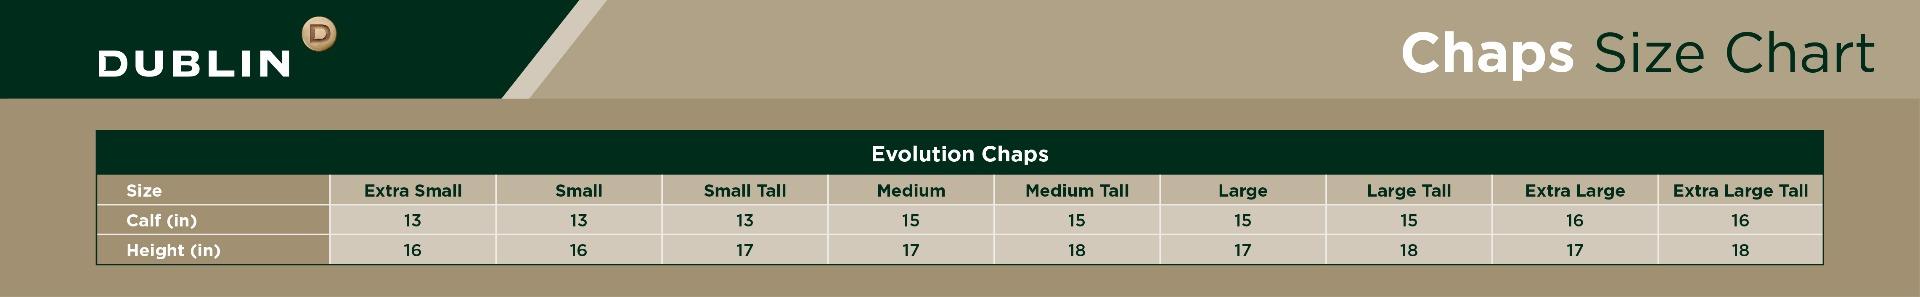 Dublin Evolution Half Chaps Size Chart